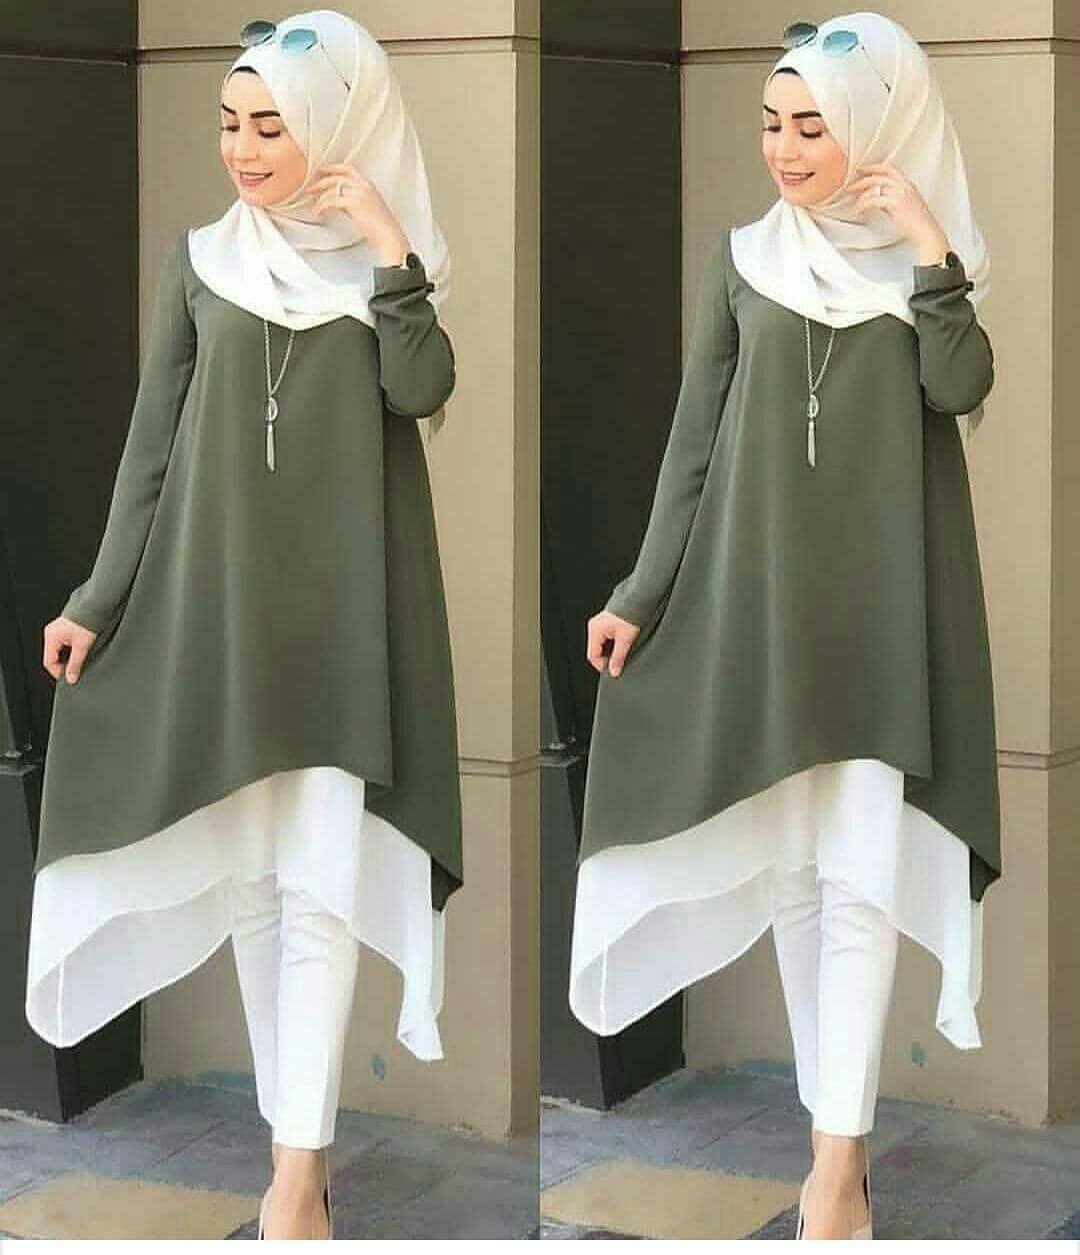 Baju Muslim Kalita Tunik Wolfice Atasan Wanita Muslim Panjang Pakaian Cewek  Original Fashion Terbaru Kekinian Blouse 6cd1a57805